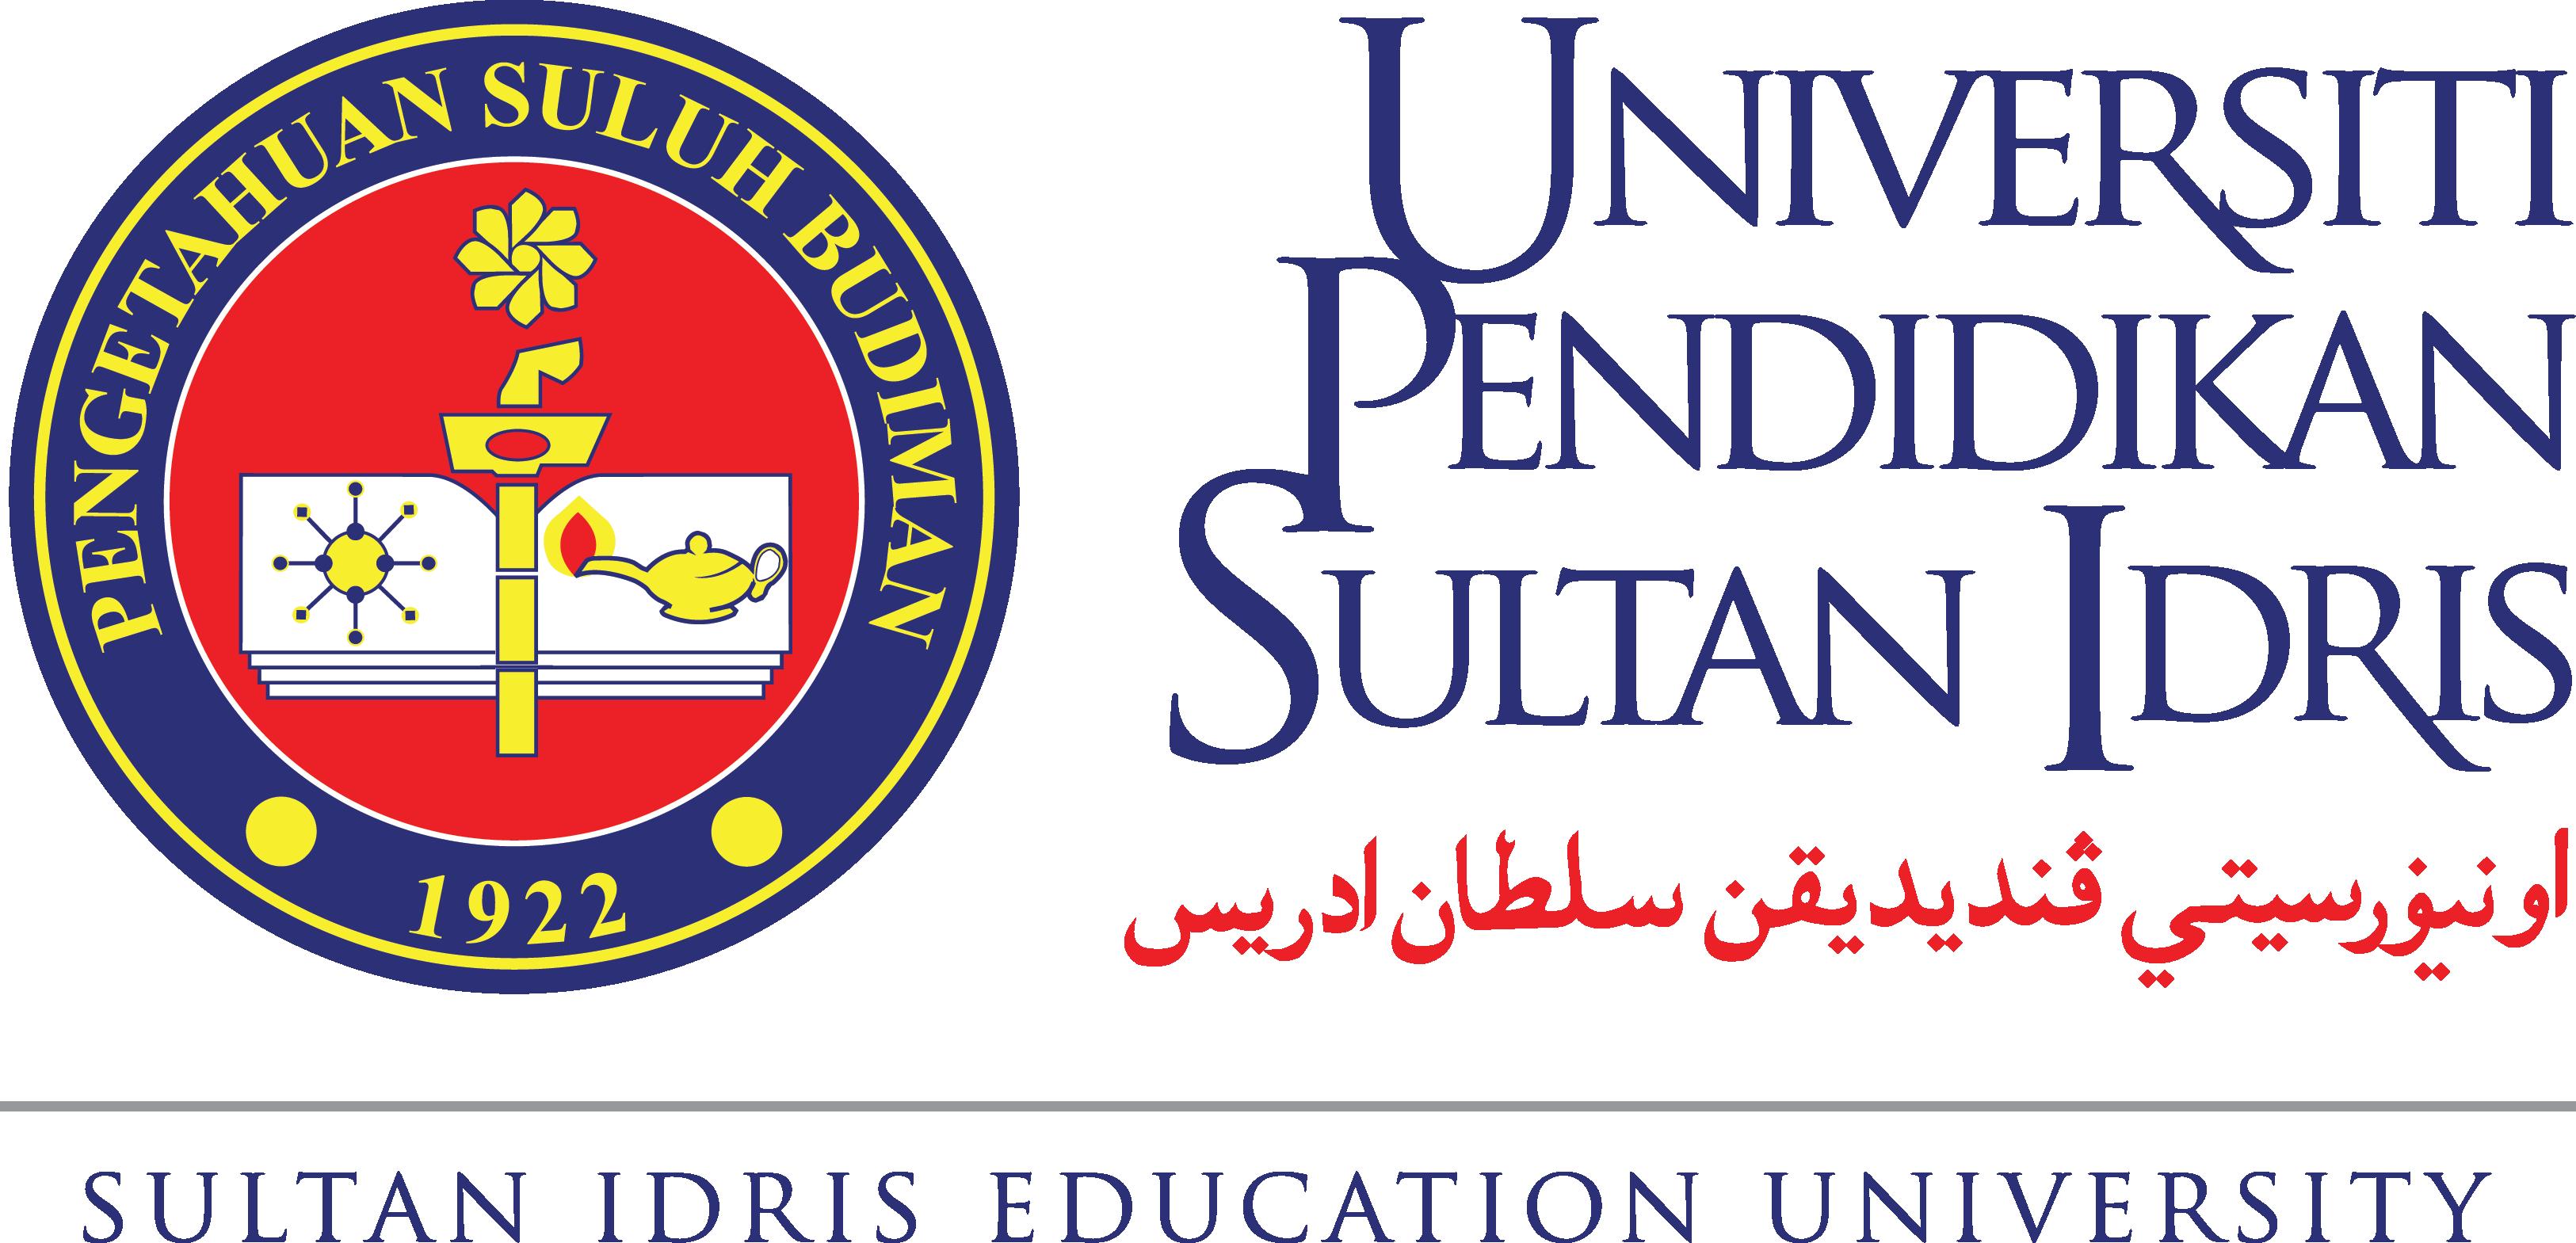 Universiti pendidikan sultan idris logo - Dr Muhamad Hariz